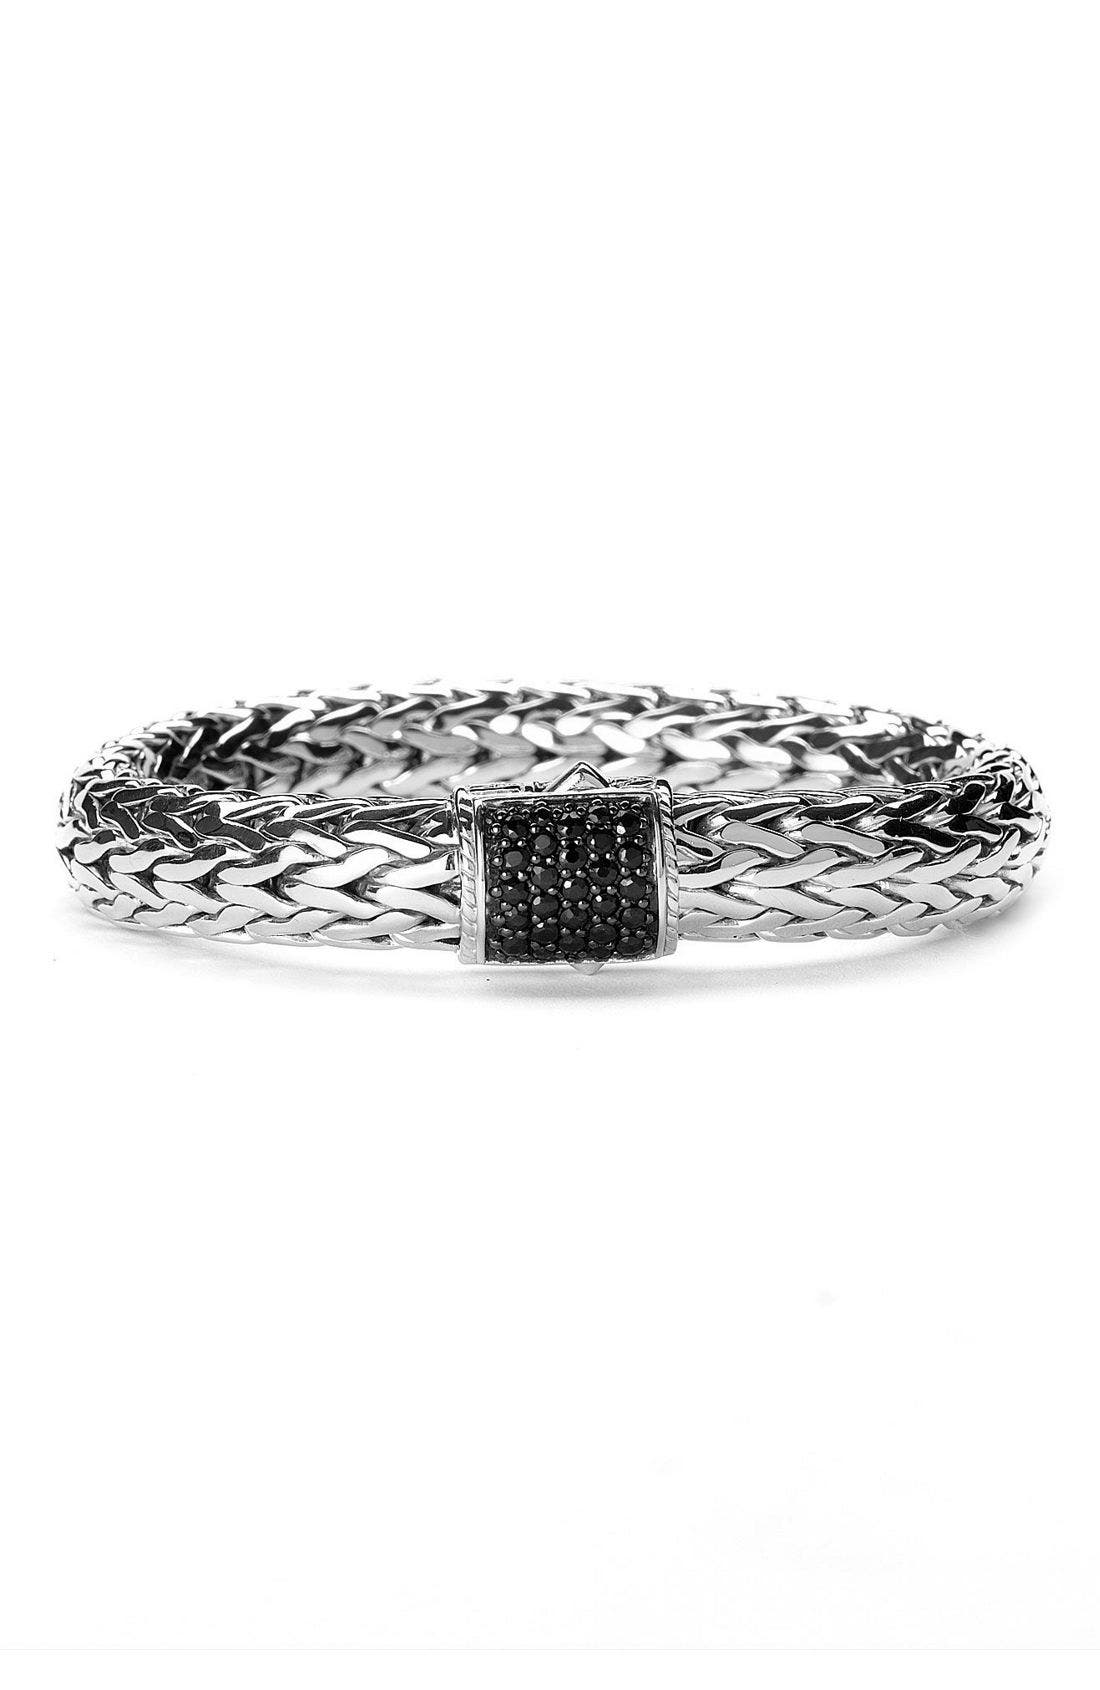 Main Image - John Hardy 'Batu' Chain Bracelet